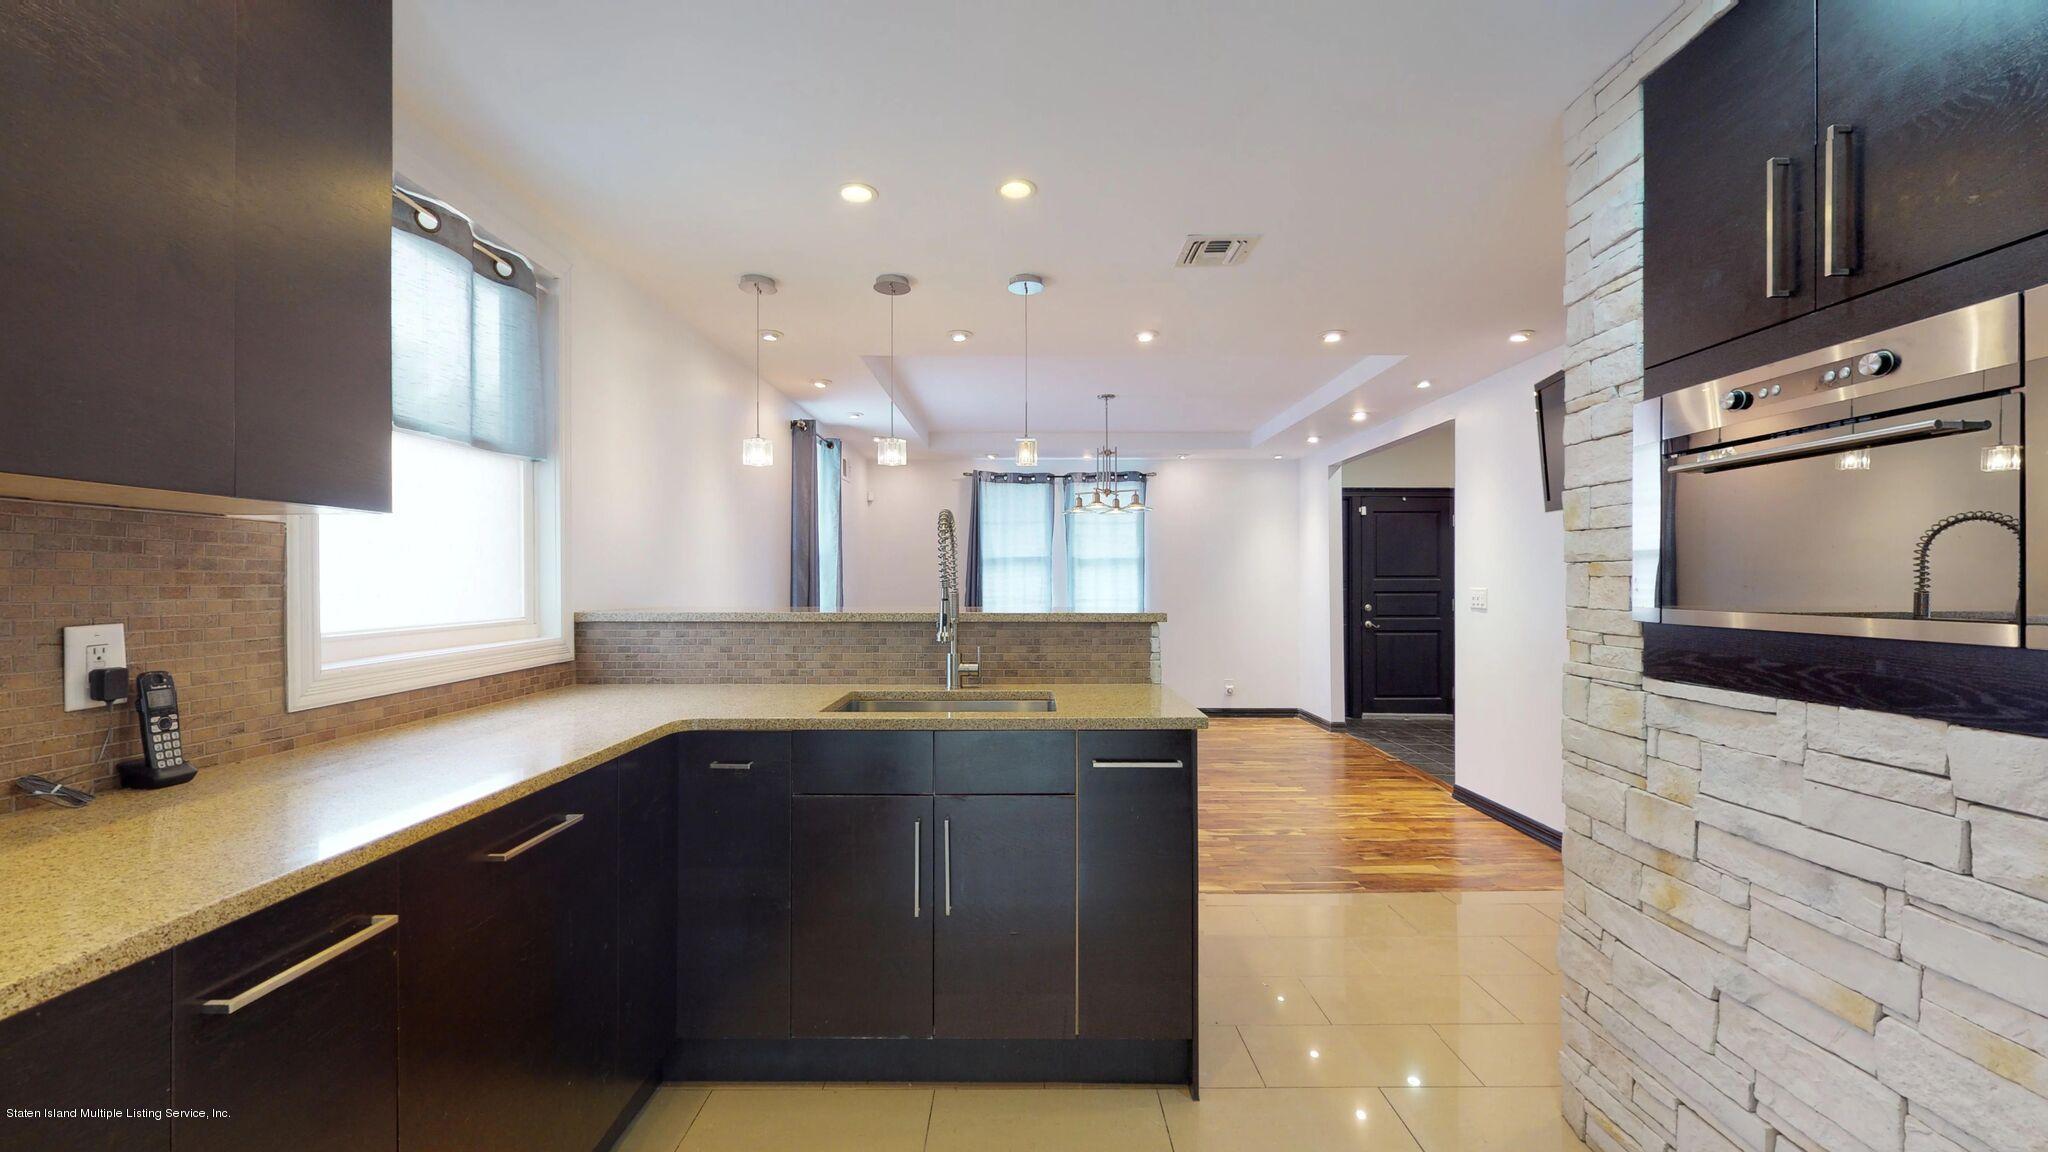 Single Family - Detached 128 Pelton Avenue  Staten Island, NY 10310, MLS-1124023-14